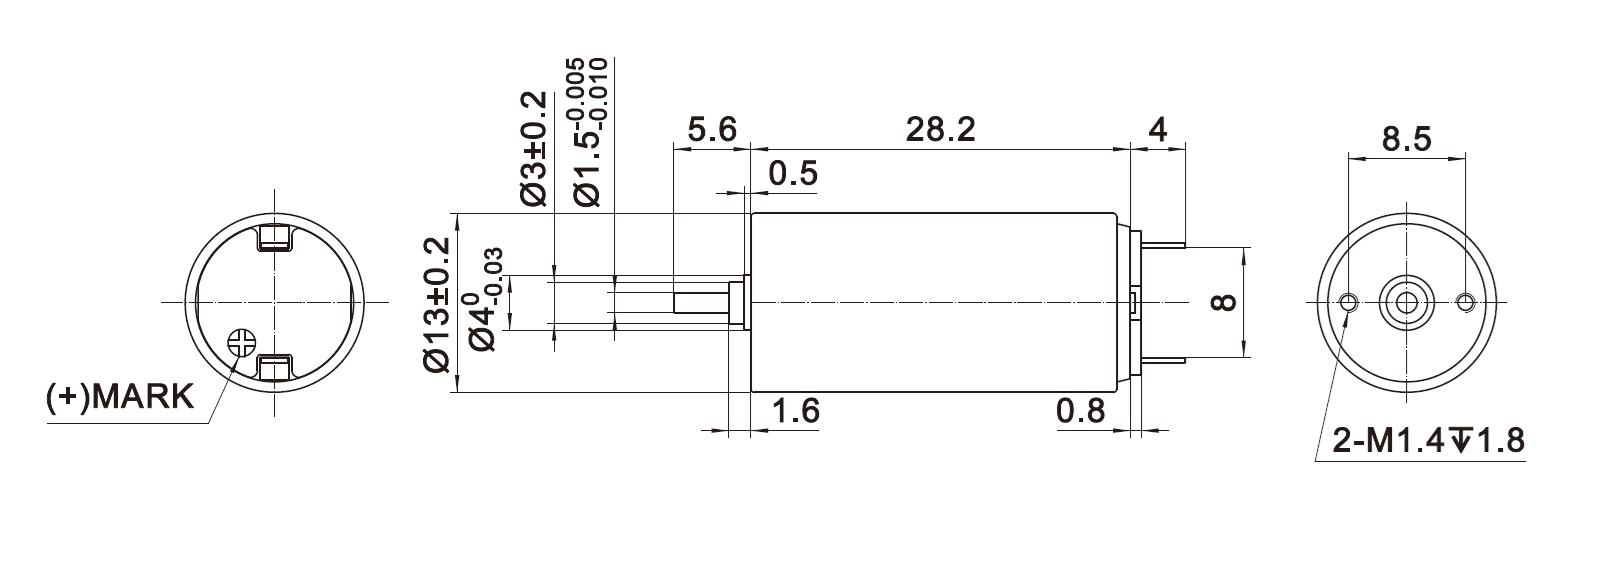 Dimension of DCU13028 Coreless Brushed DC Motors